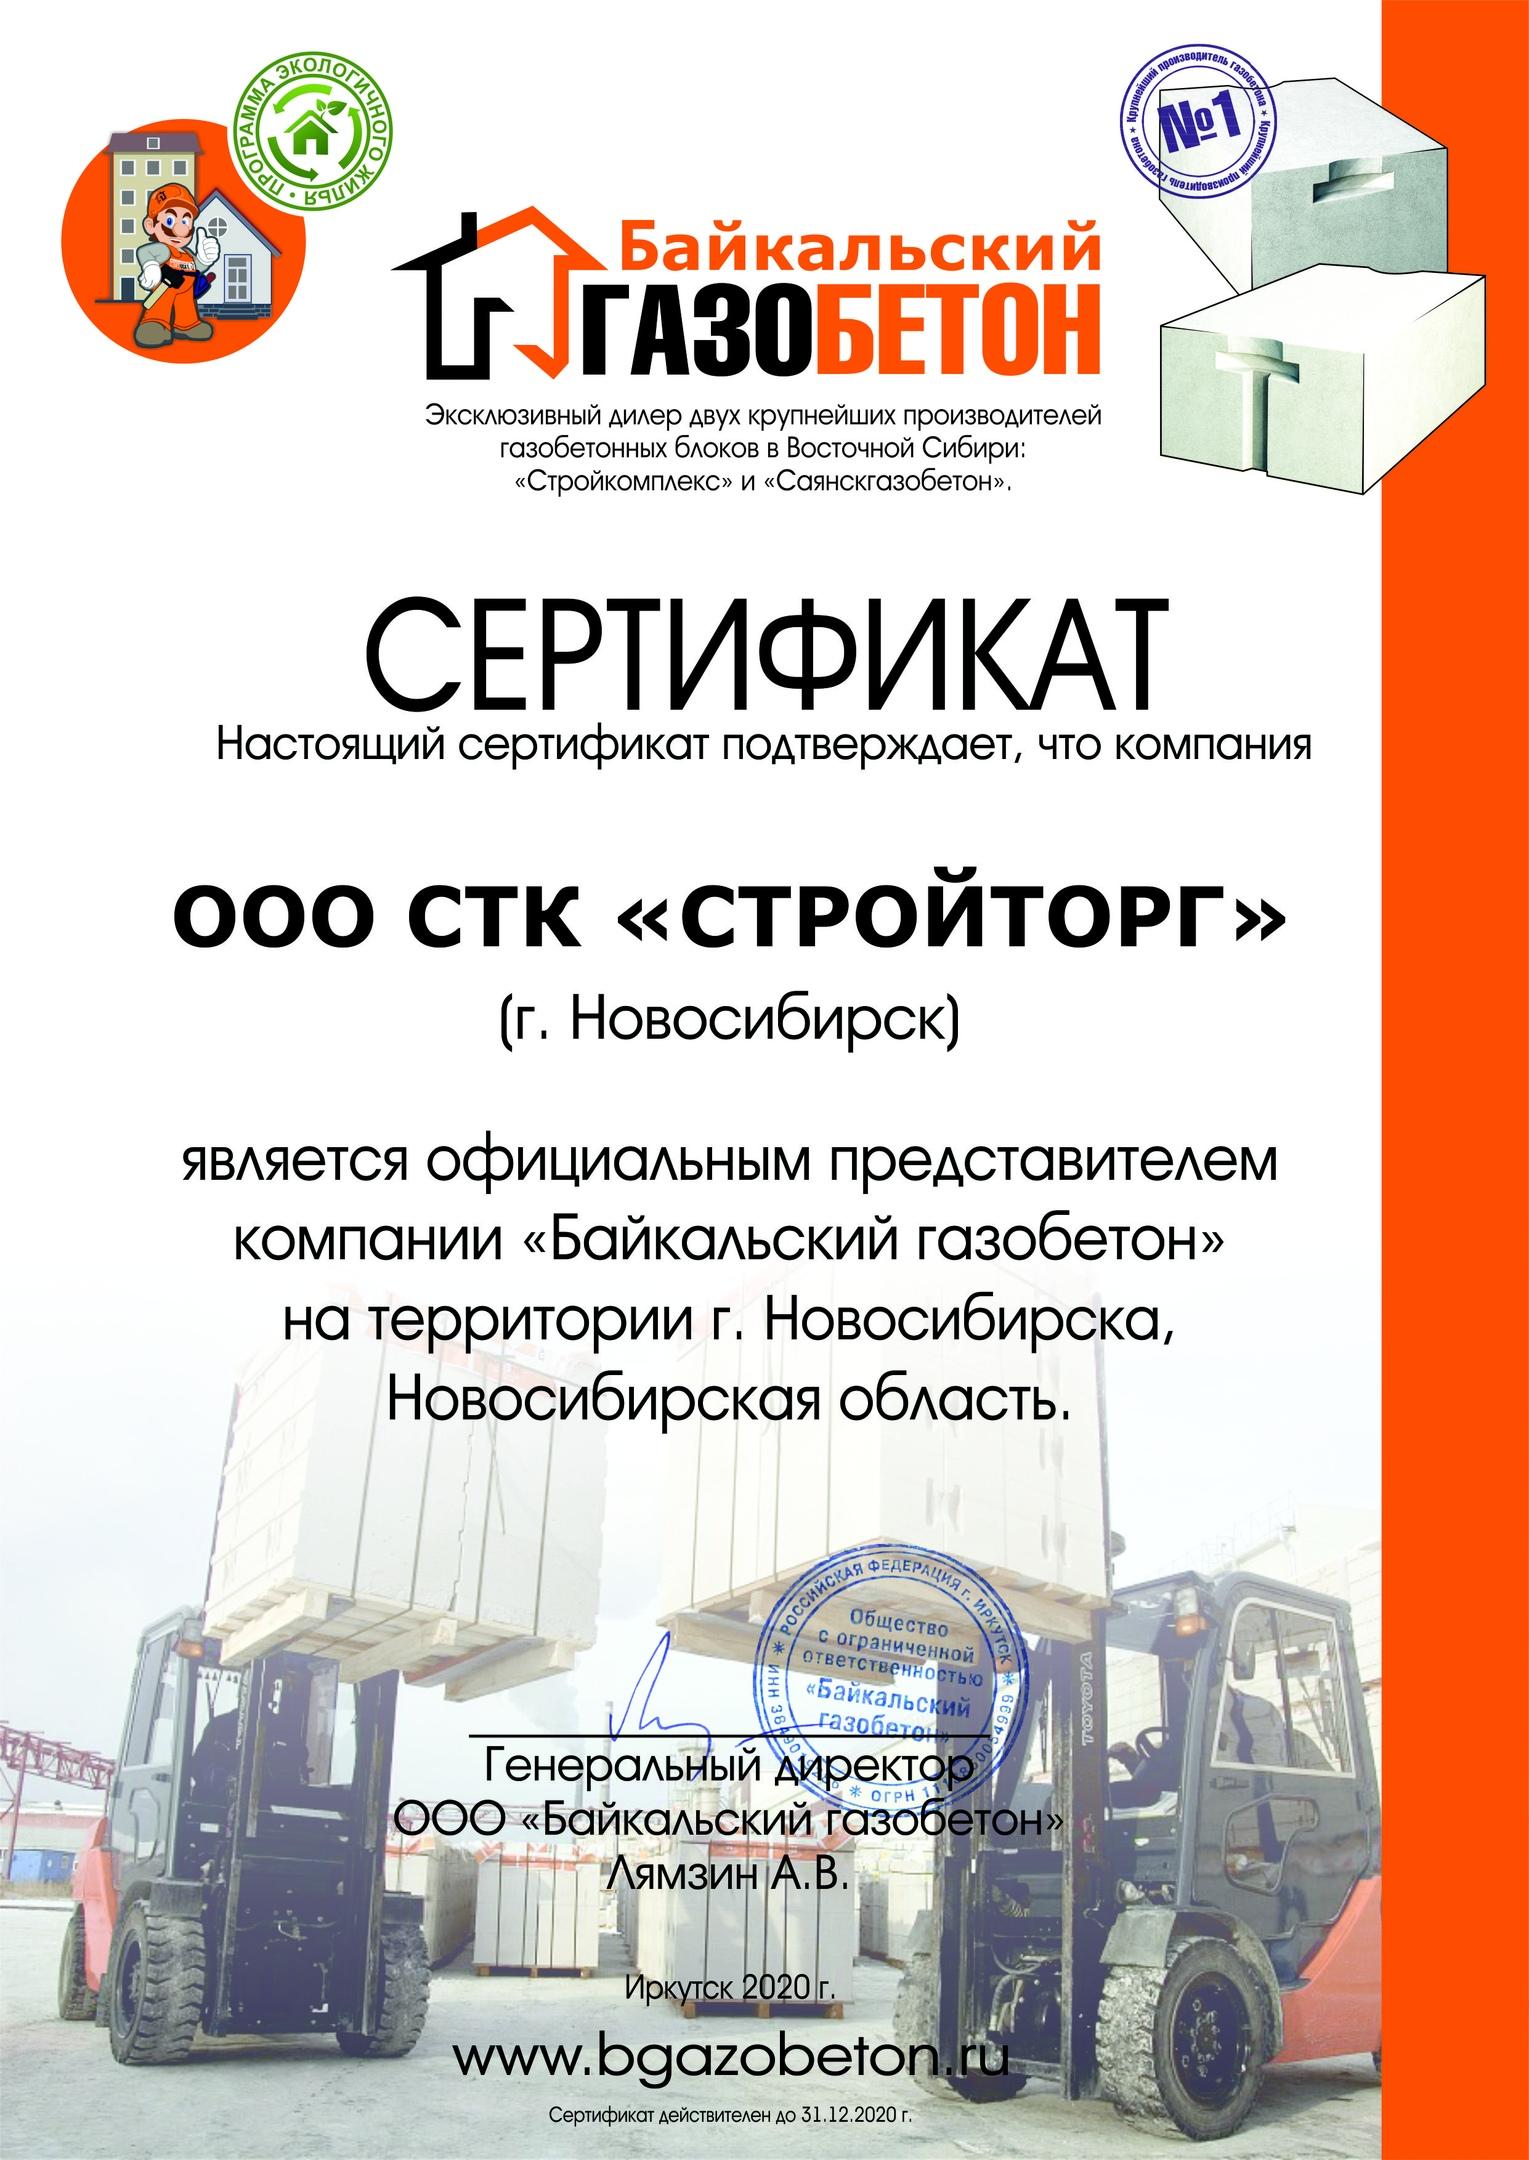 сертификат Байкальский Газобетон